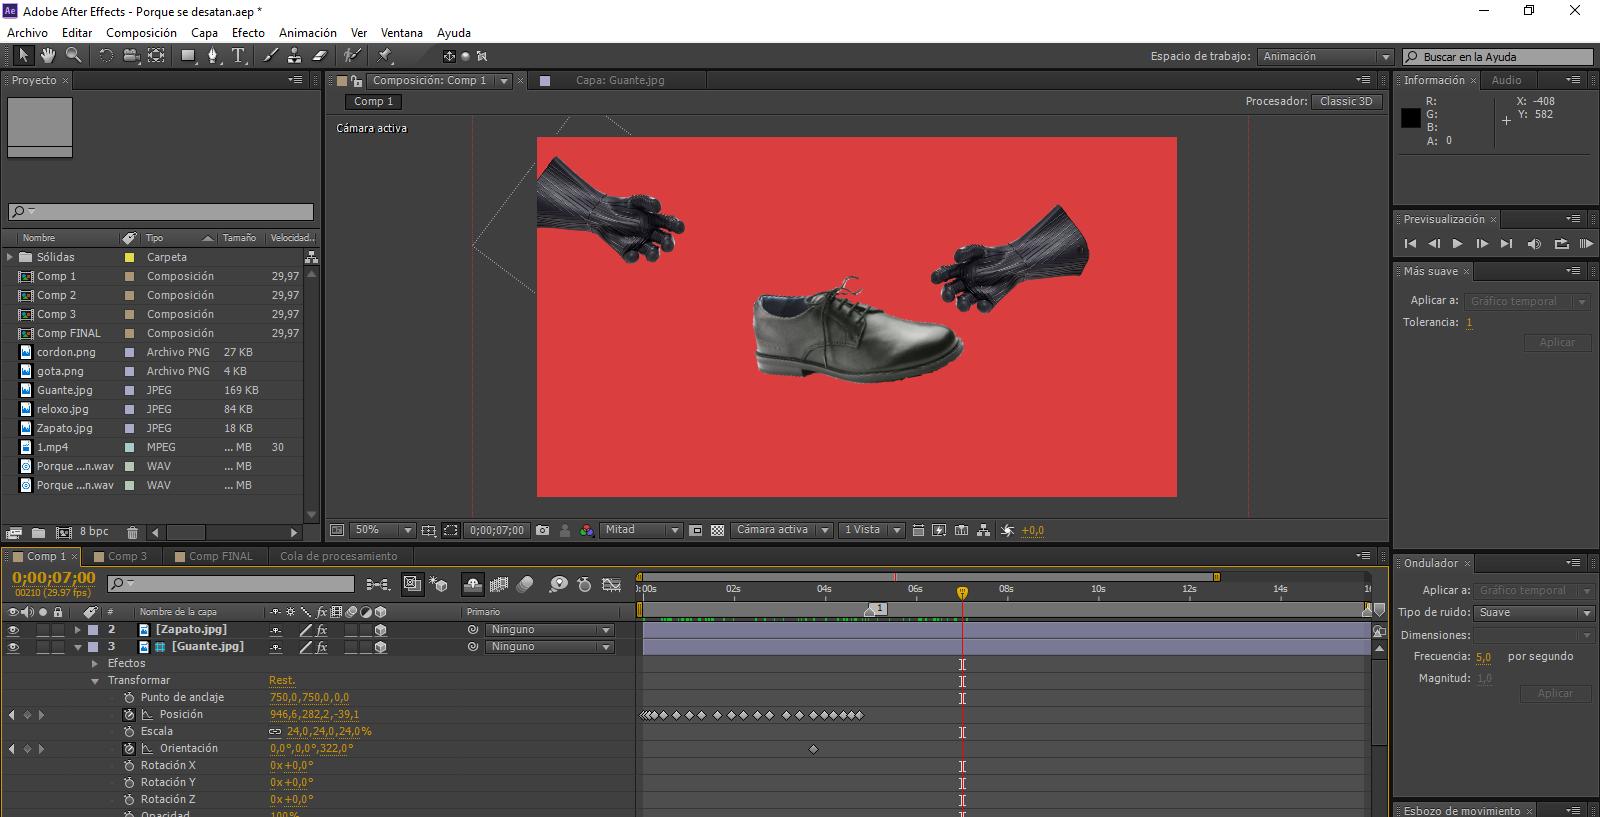 Adobe After Effects - Porque se desatan.aep _ 23_01_2020 23_55_03.png